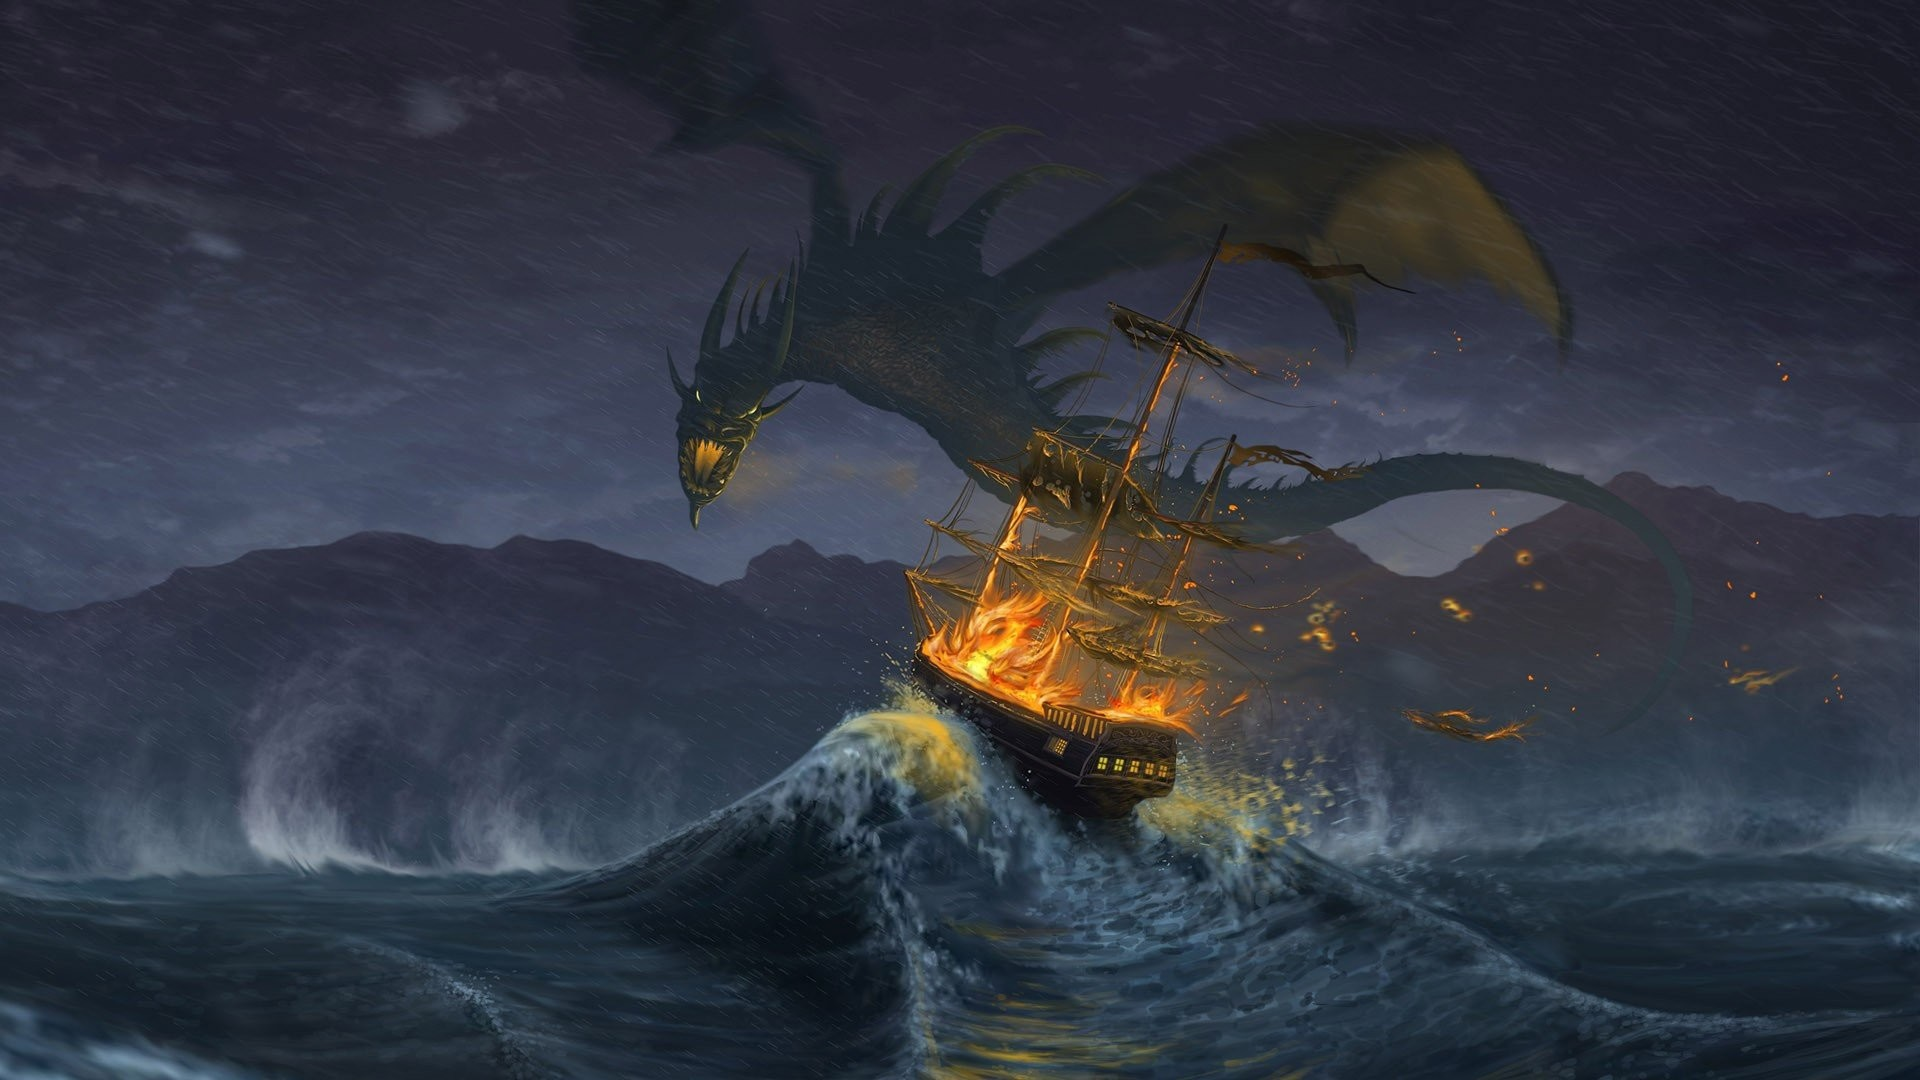 Dragon Attacking The Ship …